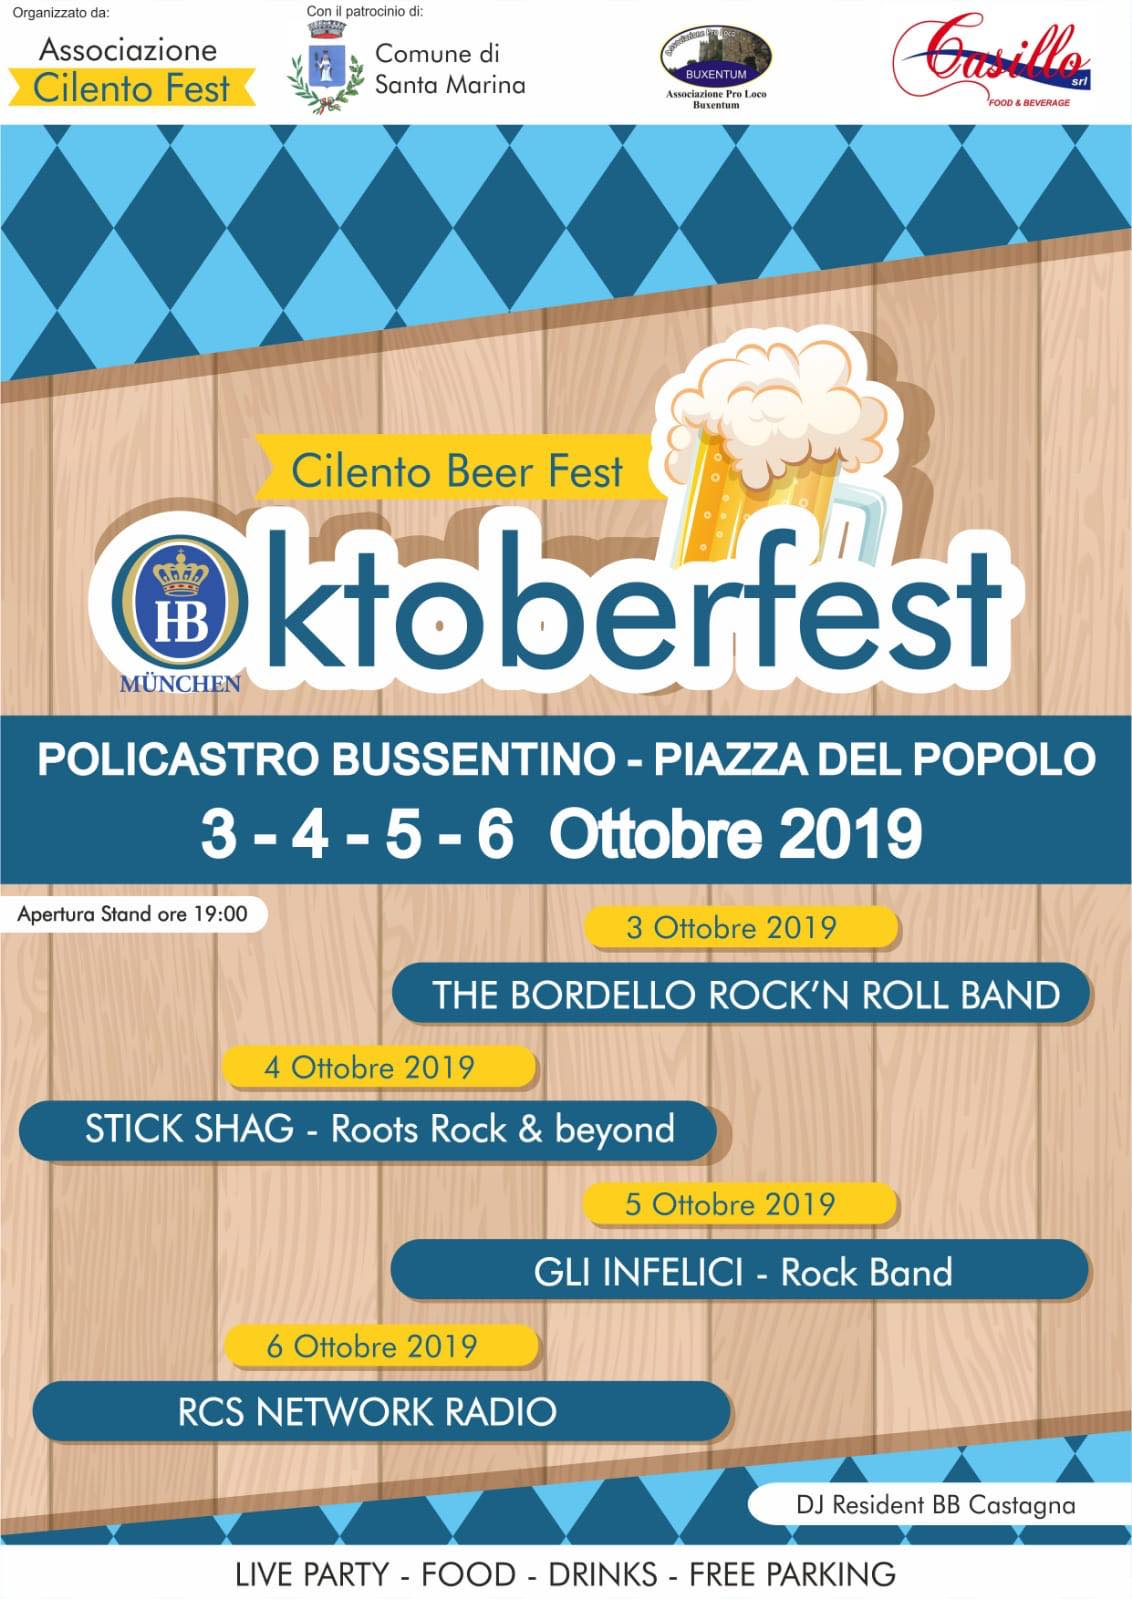 Oktoberfest Policastro - A Policastro (SA) arriva l'Oktoberfest CILENTO BEER FEST